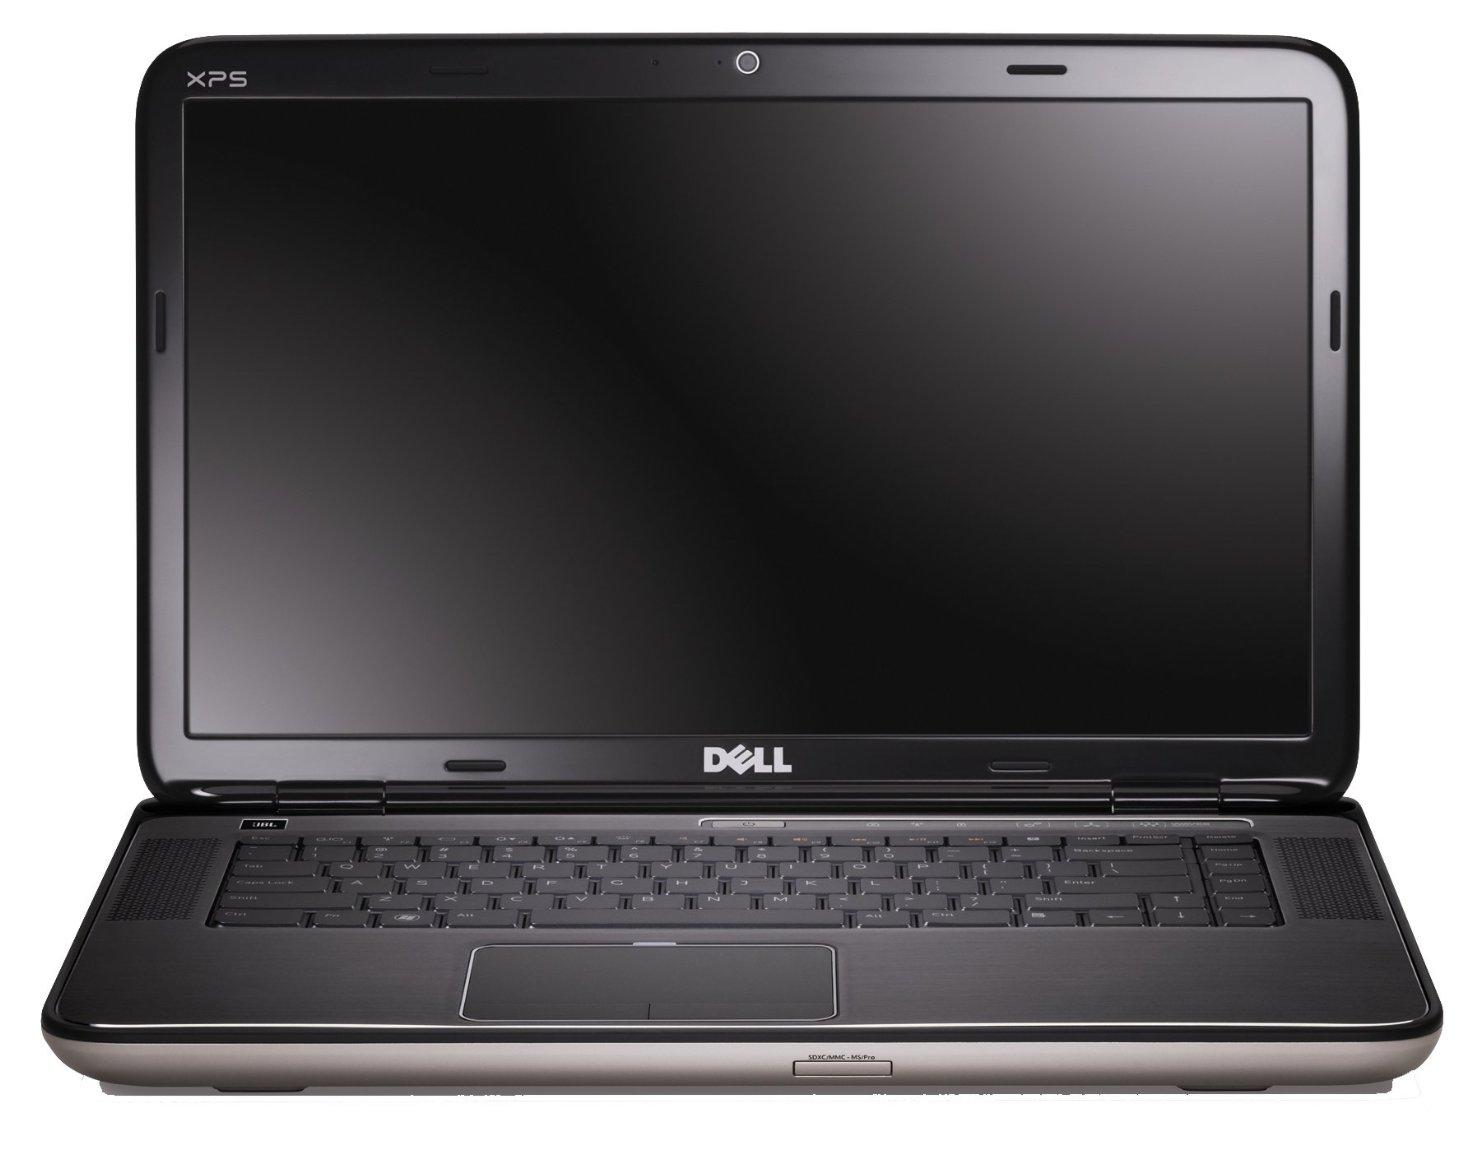 Купить Ноутбук Dell XPS 15 (9570-1080) фото 1